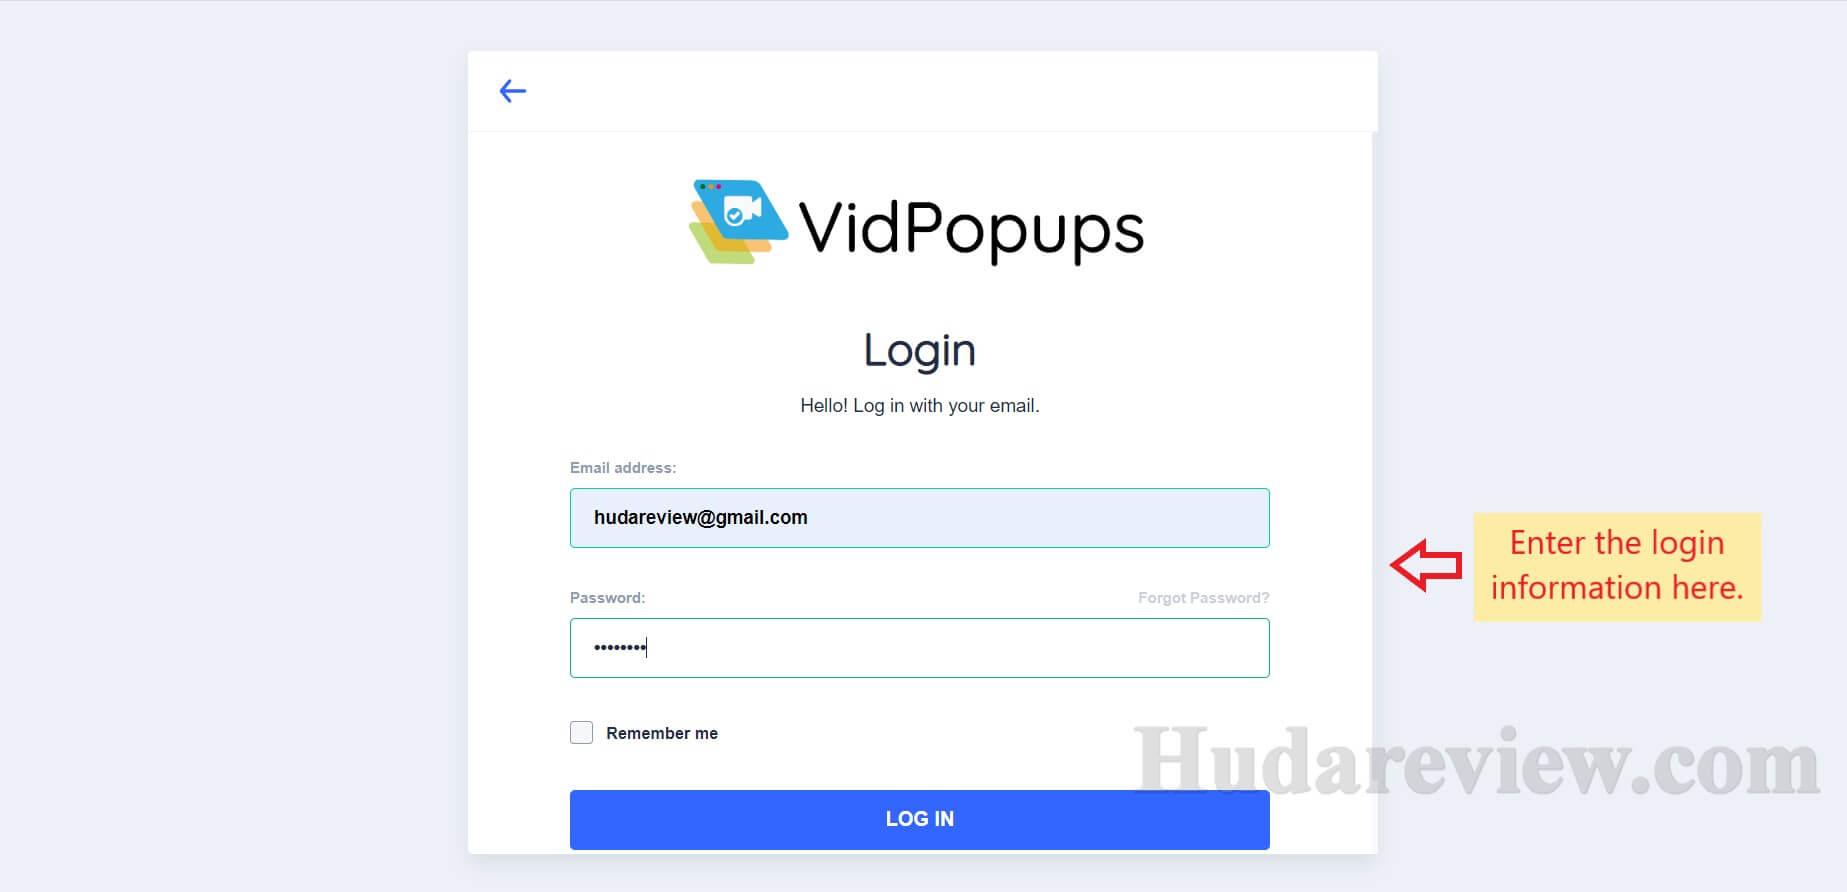 Vid-Popups-Step-1-1